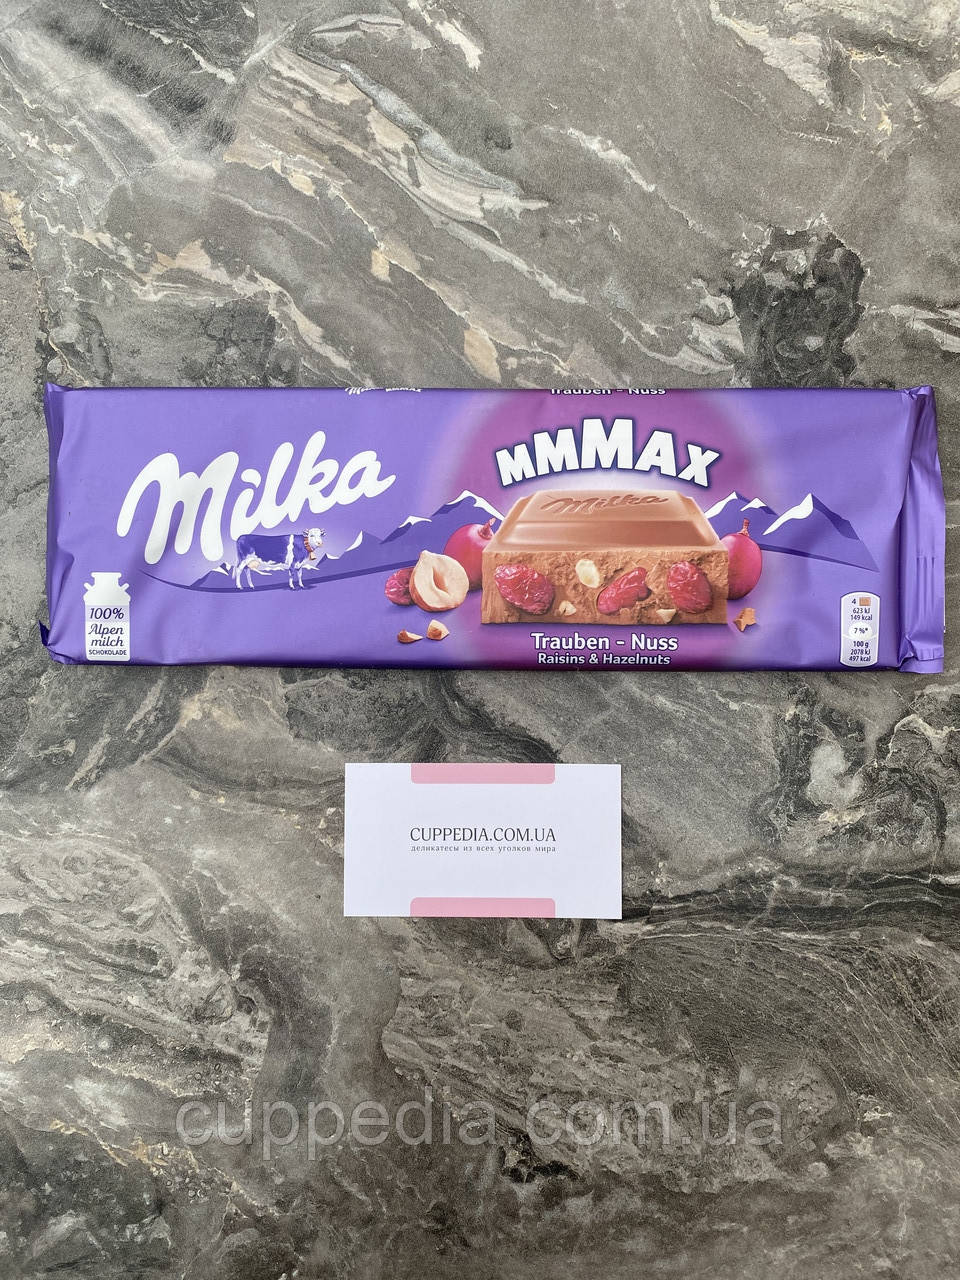 Шоколад Milka Trauben - Nuss 270 грм